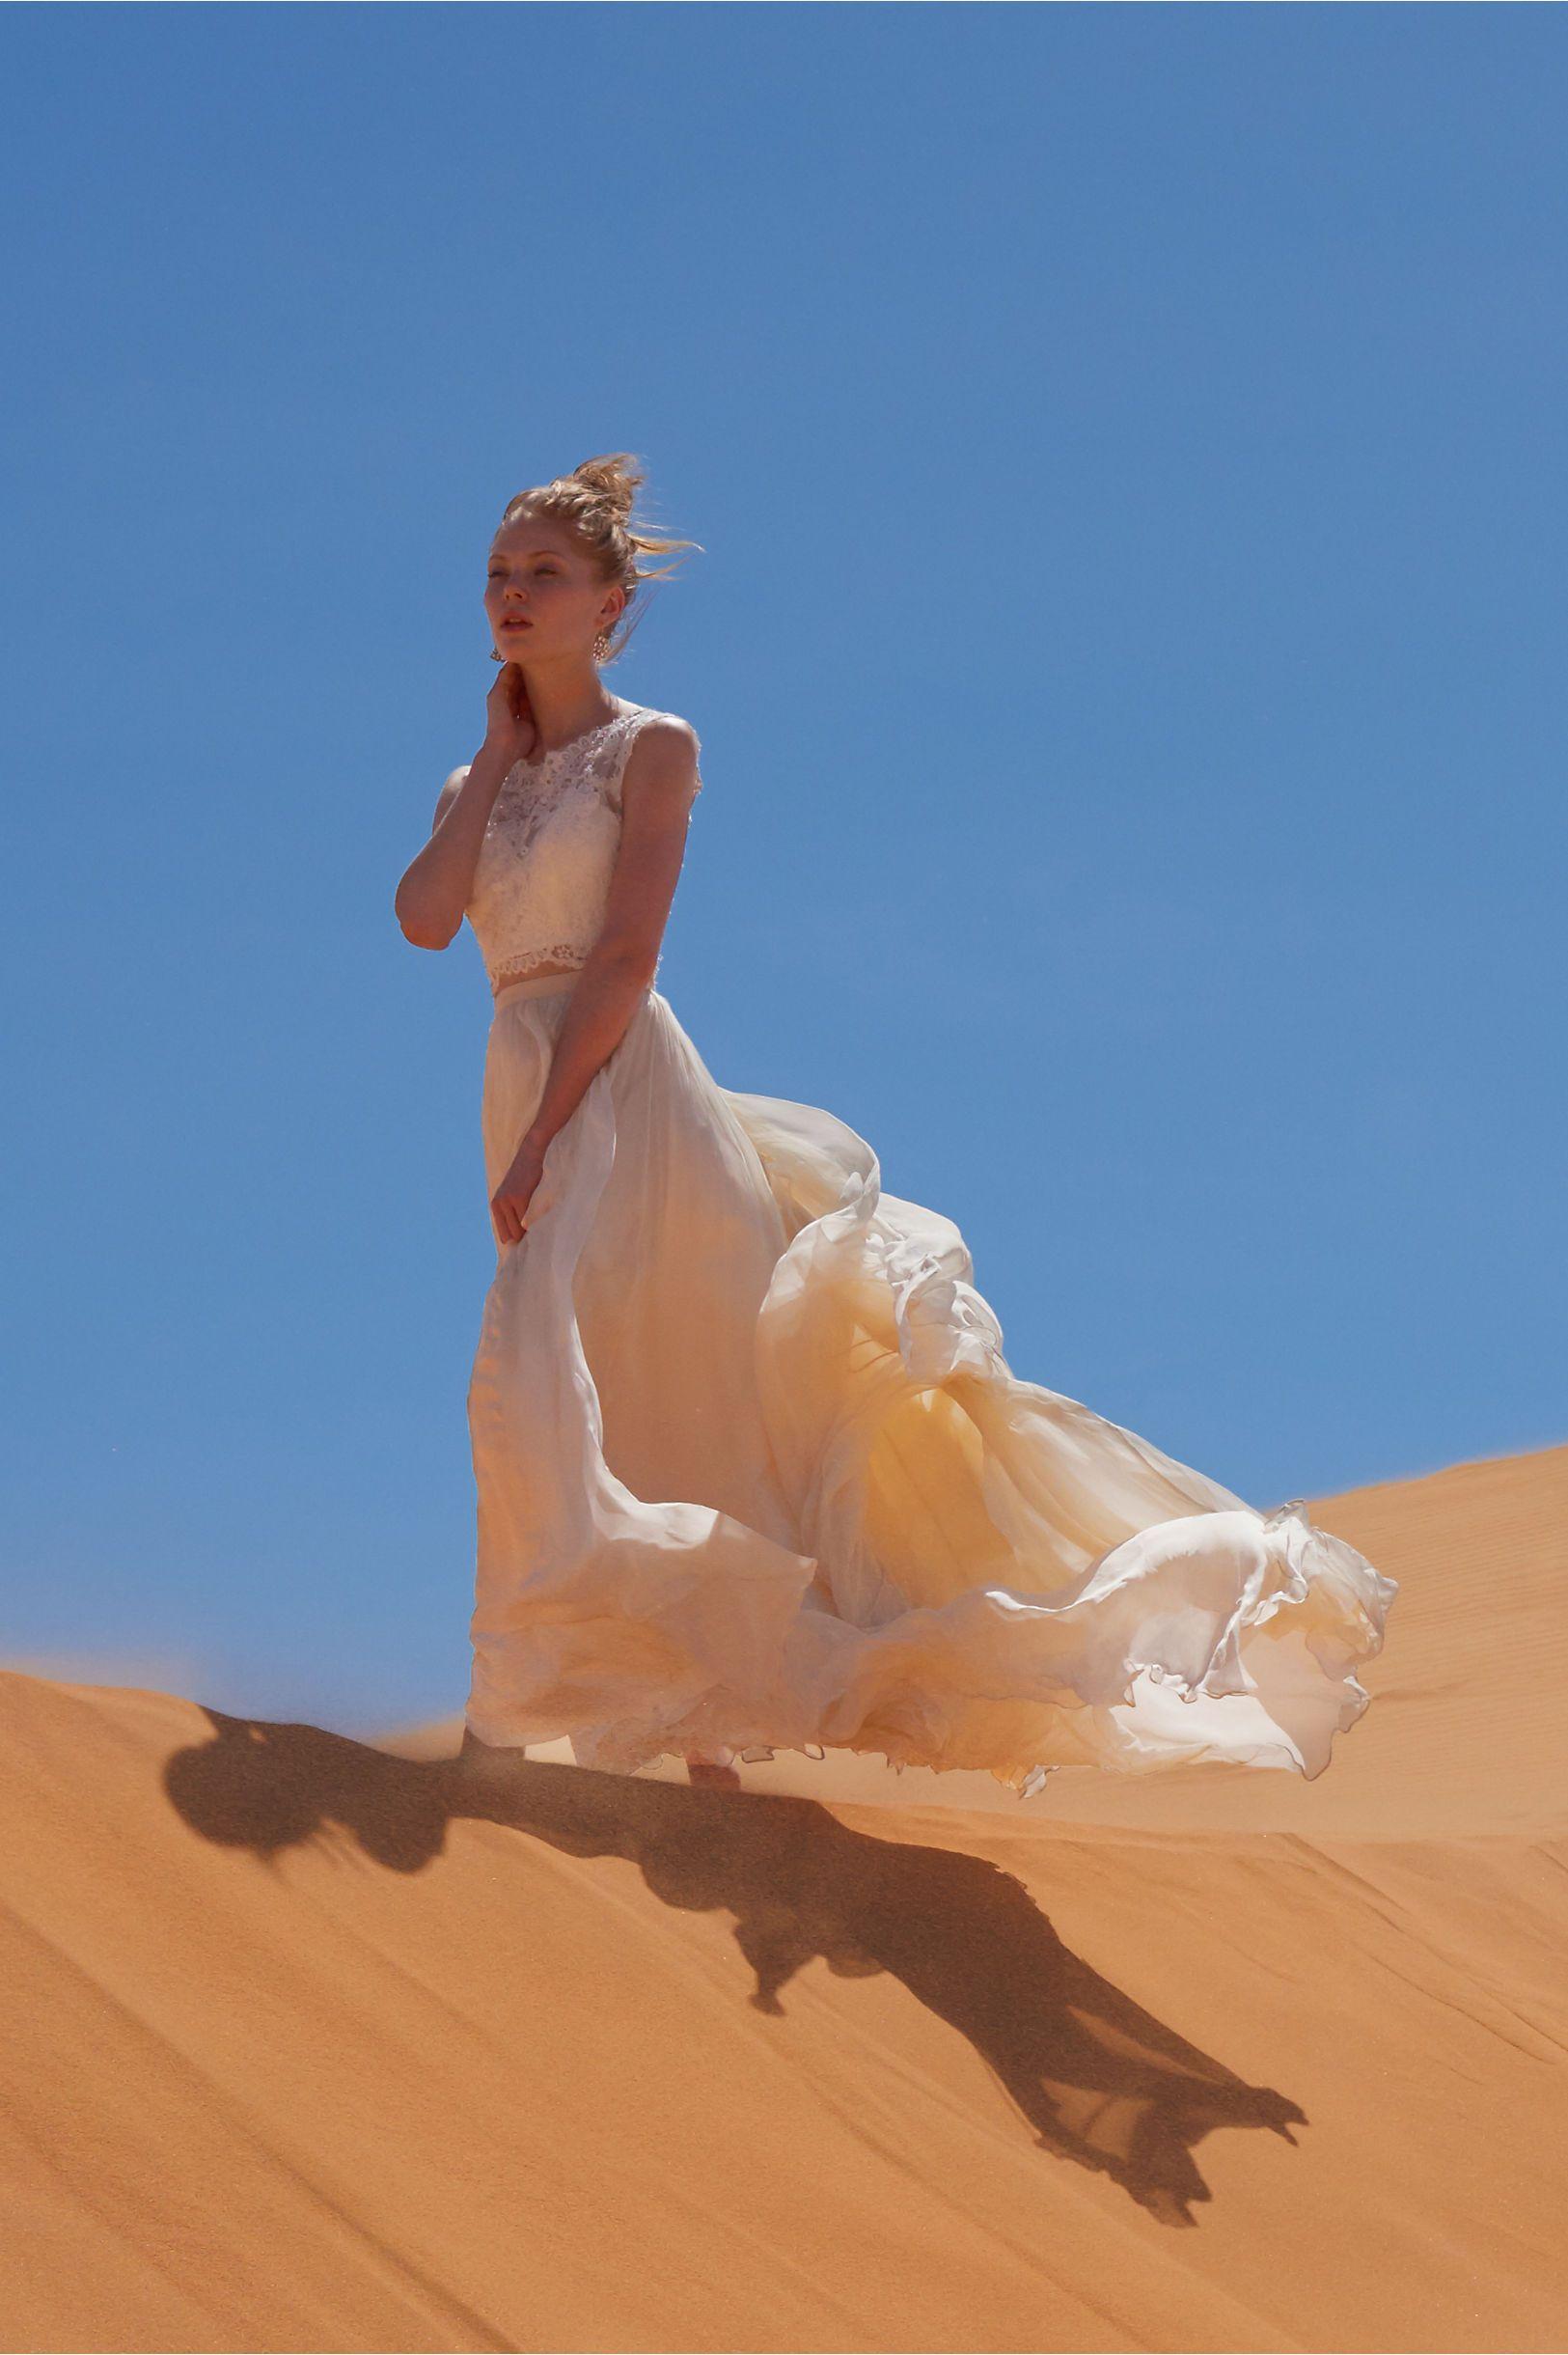 BHLDN Brody Top & Delia Maxi Skirt in  Bride Wedding Dresses at BHLDN